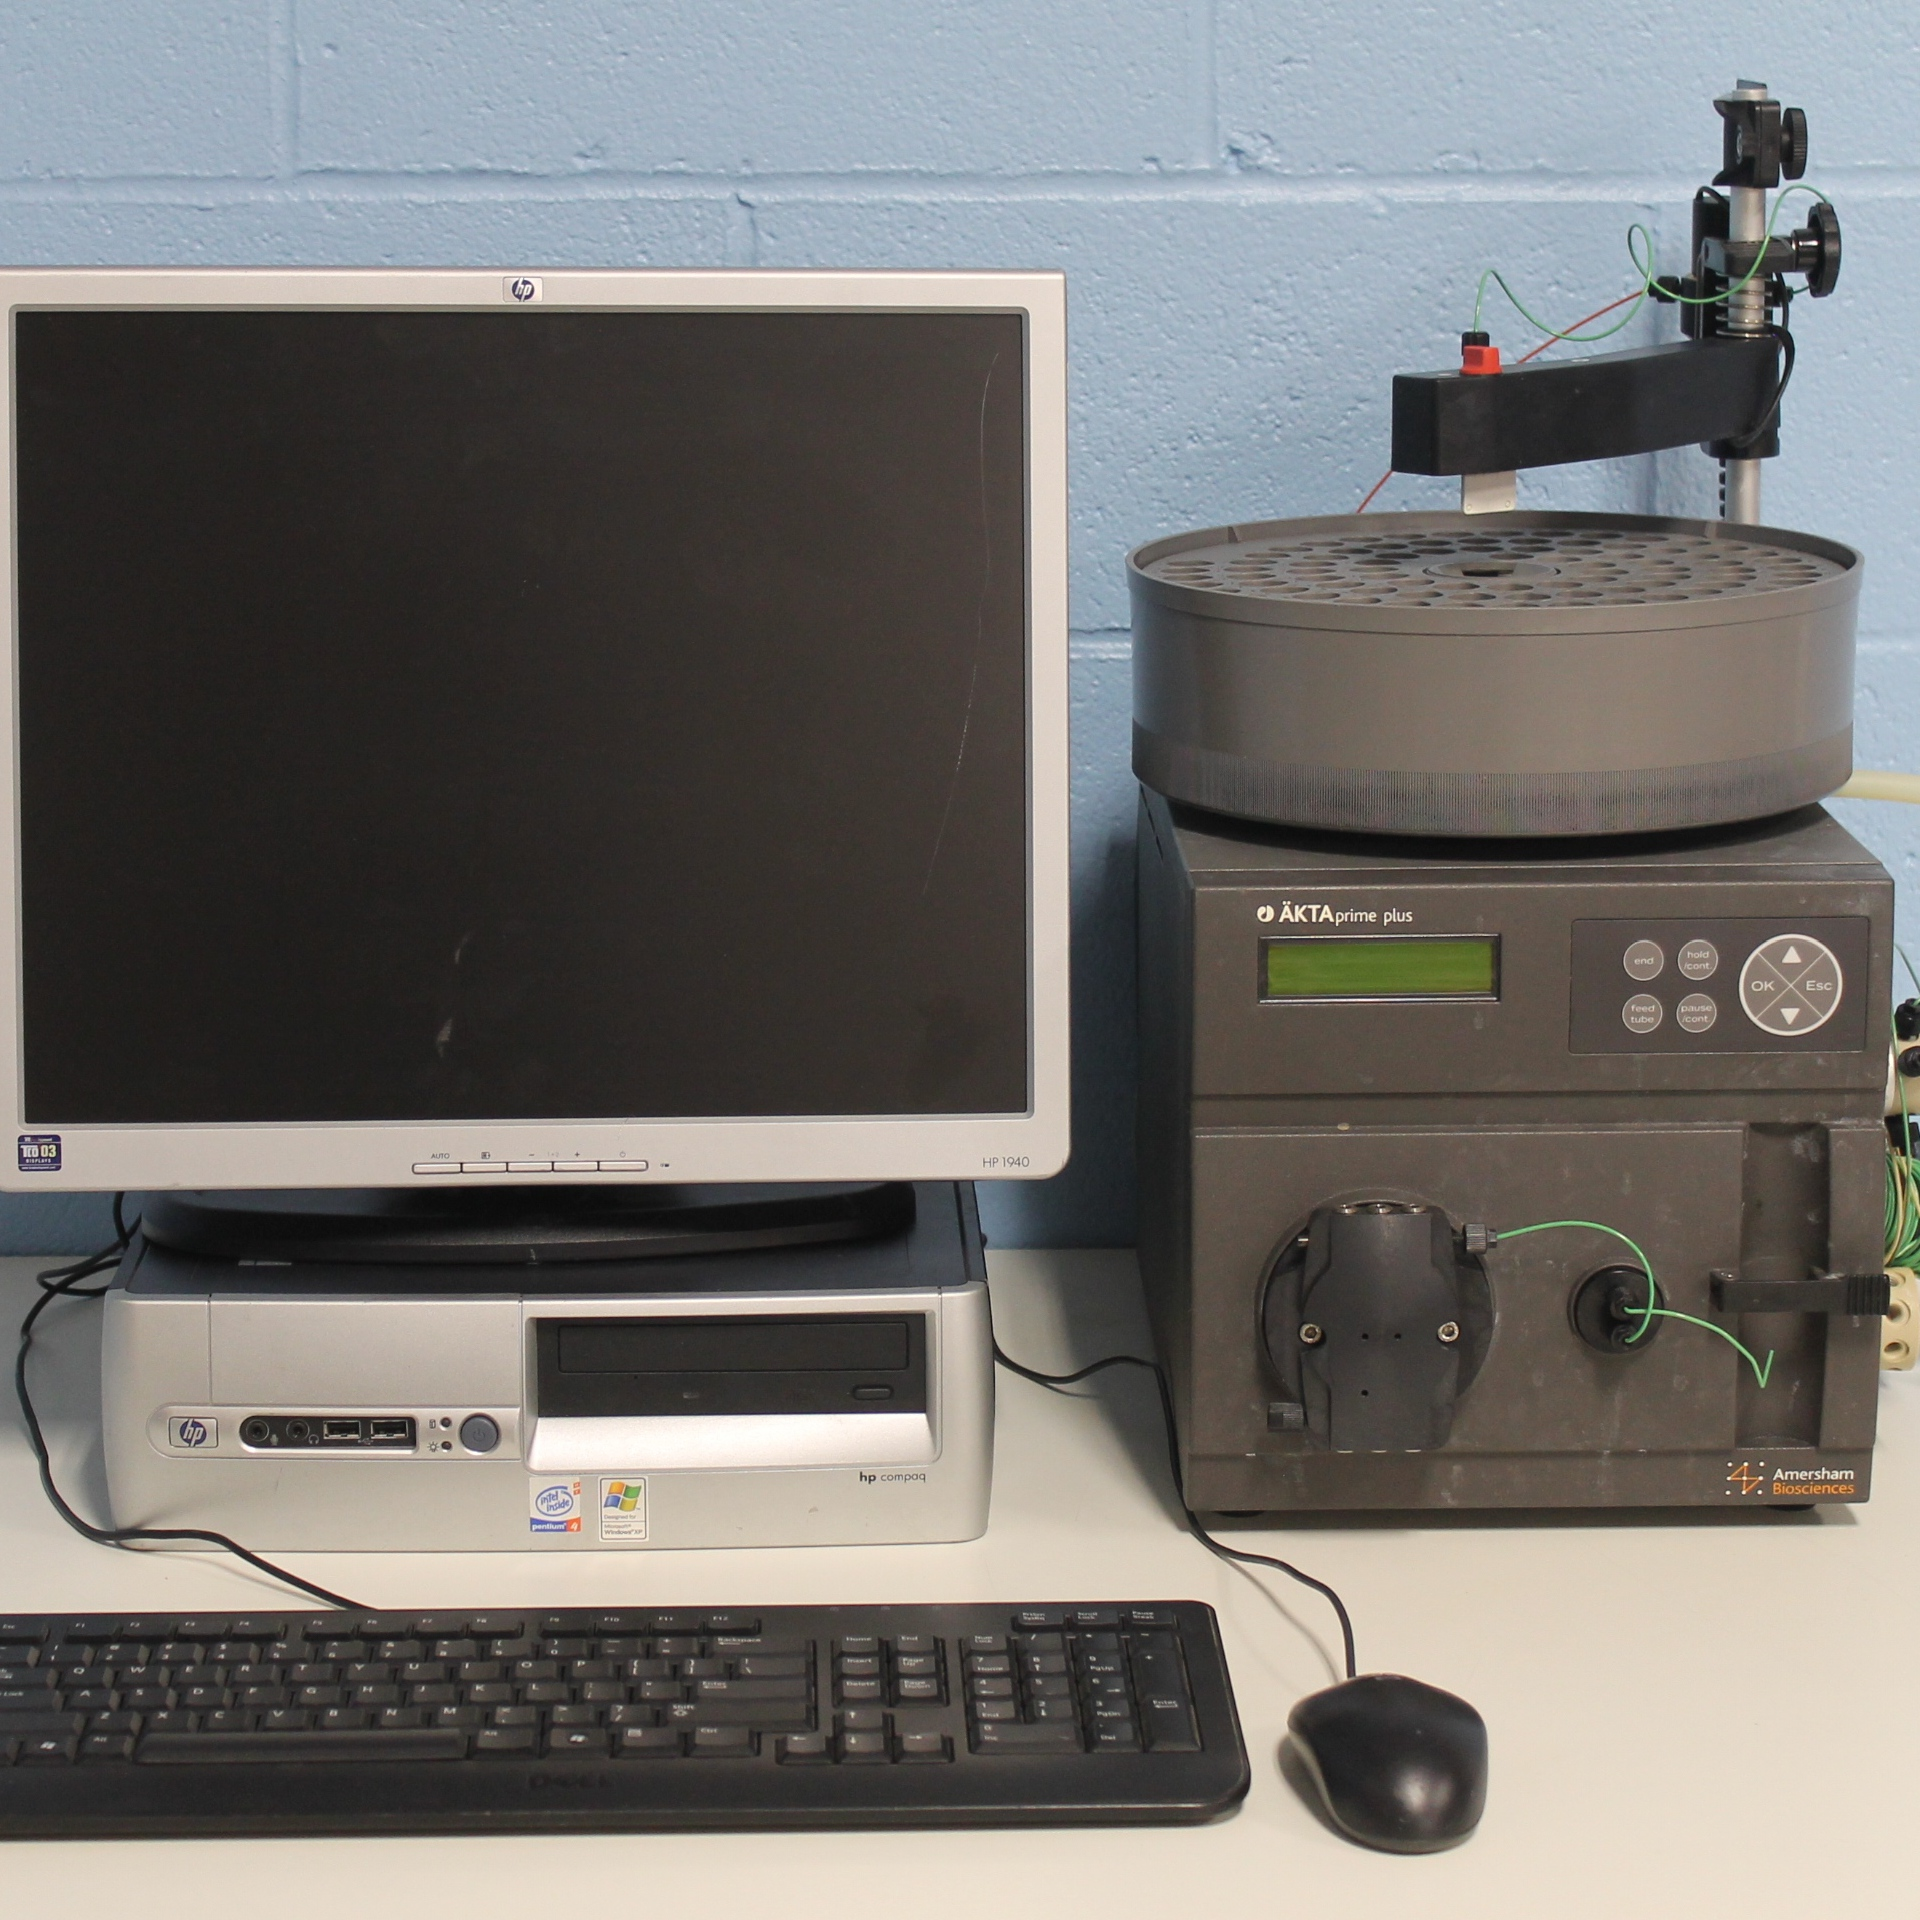 AKTA PrimePlus Automated Liquid Chromatography System Code No. 11-0013-13